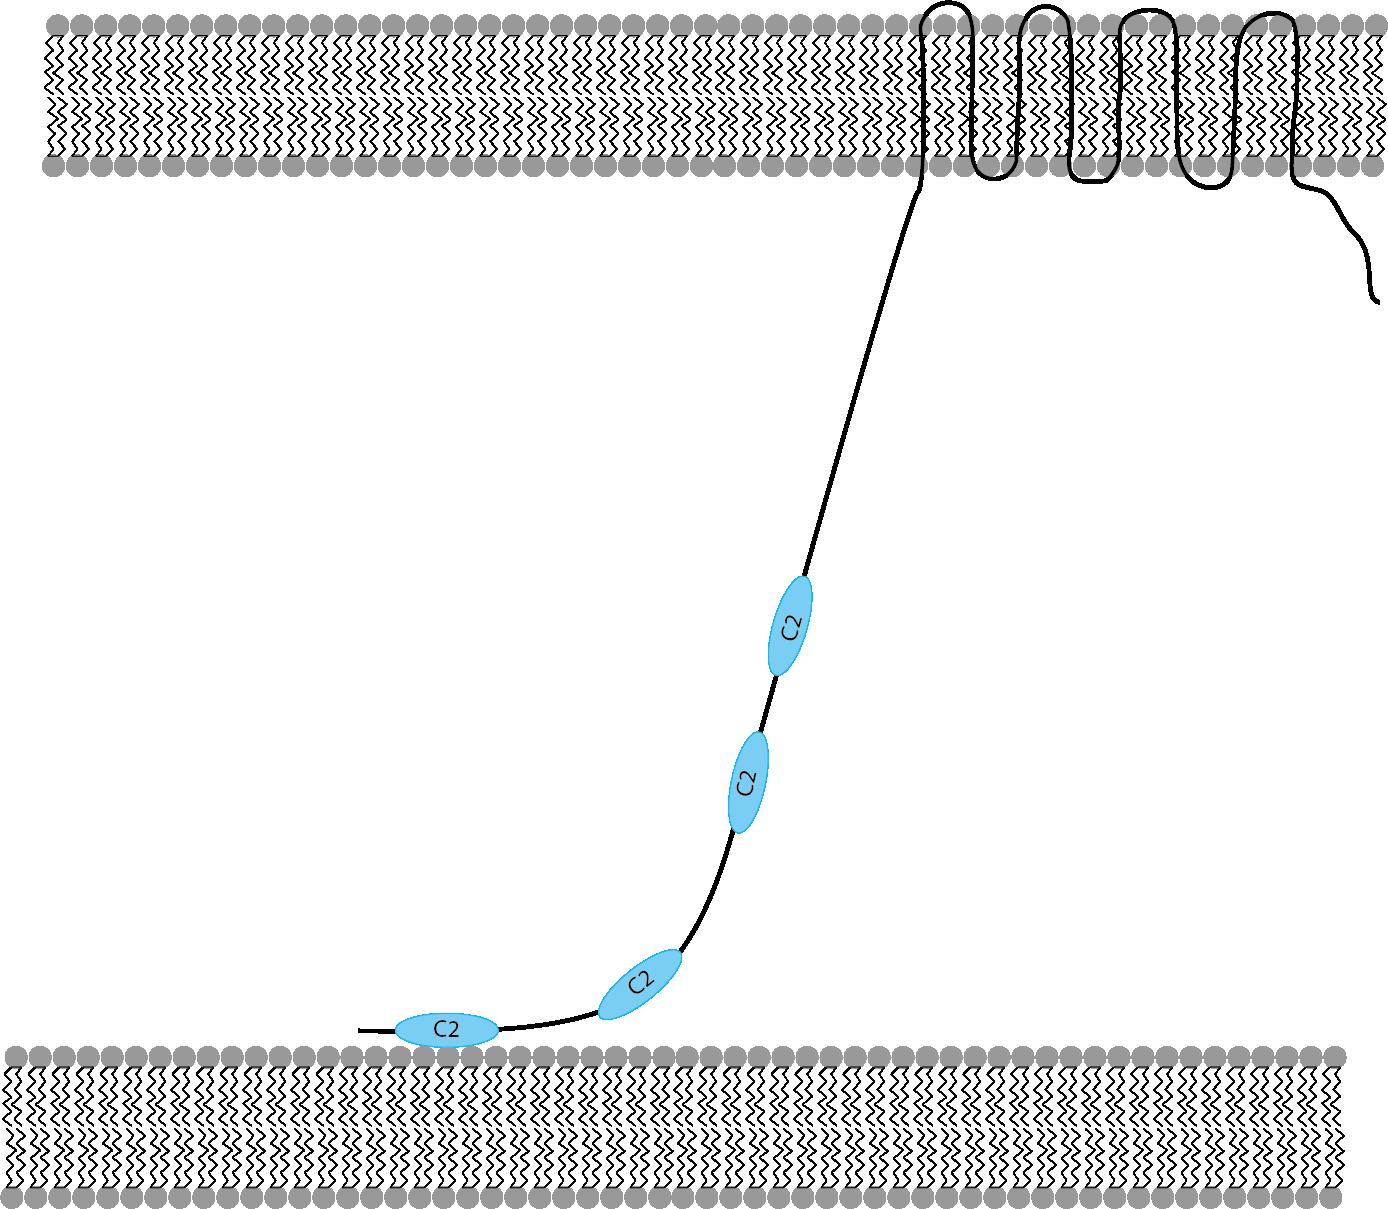 tethered membrane low Ca2+